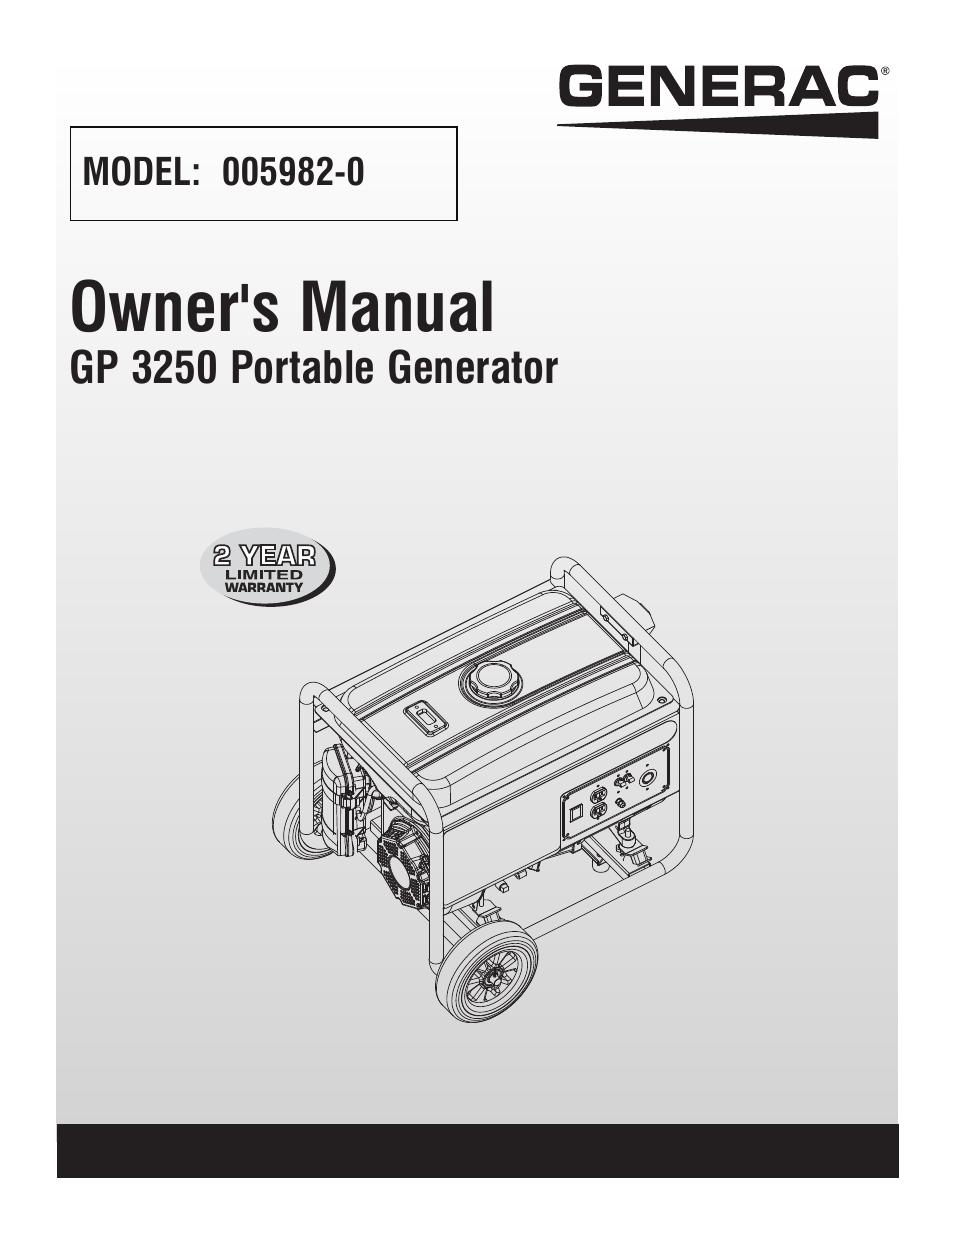 Generac Manuals Circuit Breaker Box Wiring Http Membersrennlistorg Warren Badgen4 0059435 Array Gp 3250 Portable Generator 005982 0 User Manual 20 Pages Rh Manualsdir